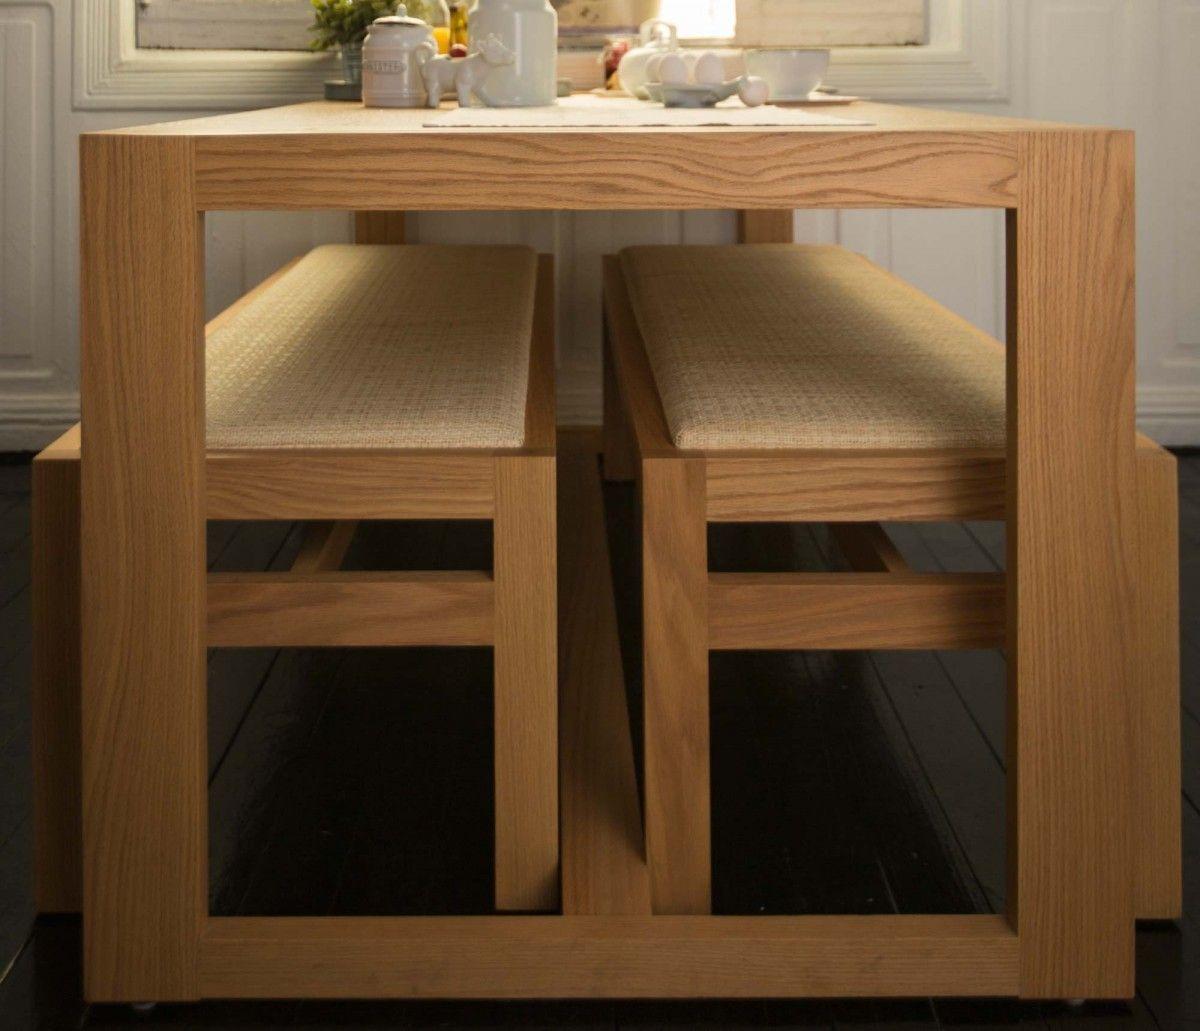 Gaia diseno contemporaneo mexicano marco de madera con for Muebles estilo mexicano contemporaneo